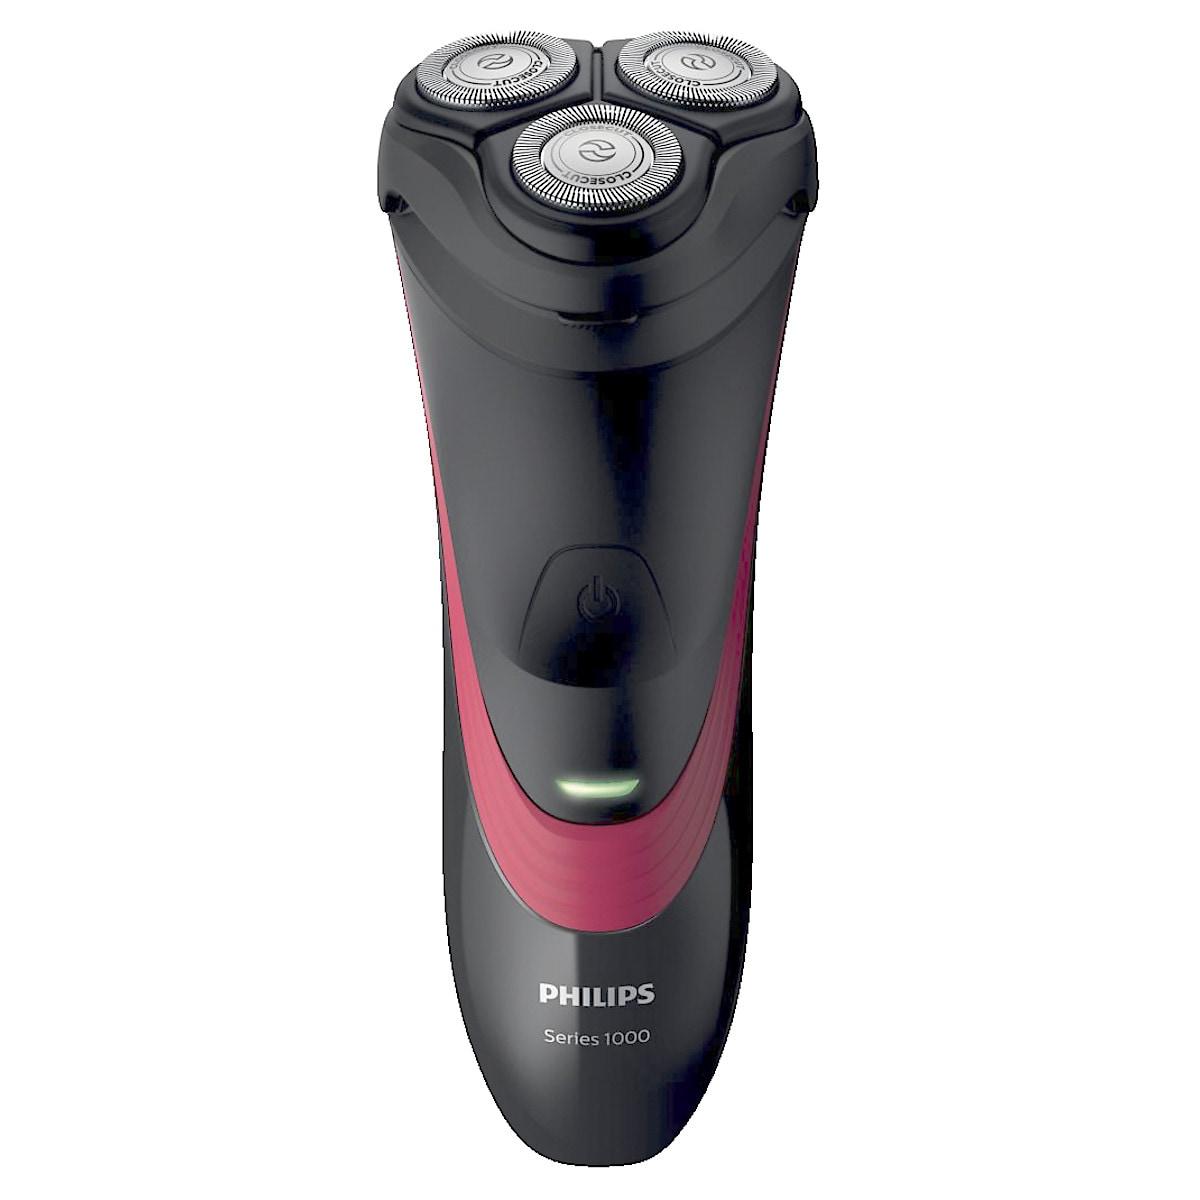 Philips S1310/04 barbermaskin